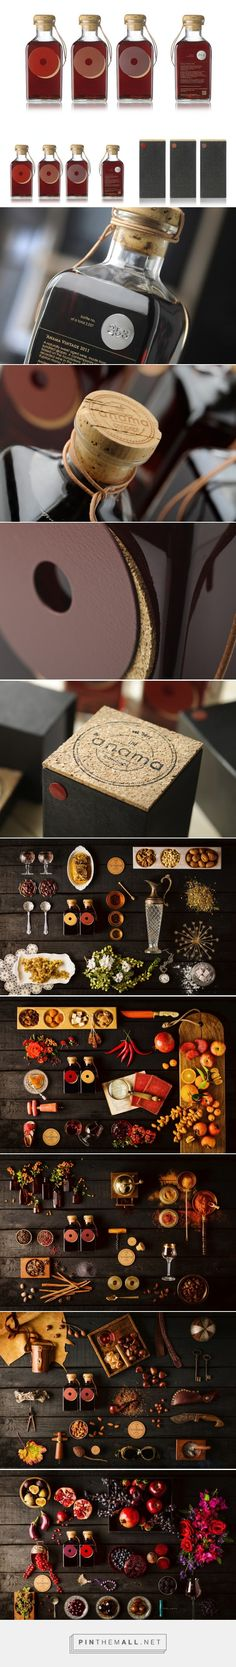 'Anama #Vintage 2011 #packaging by Kristina Apostolou Mohianakis - http://www.packagingoftheworld.com/2015/02/anama-vintage-2011.html